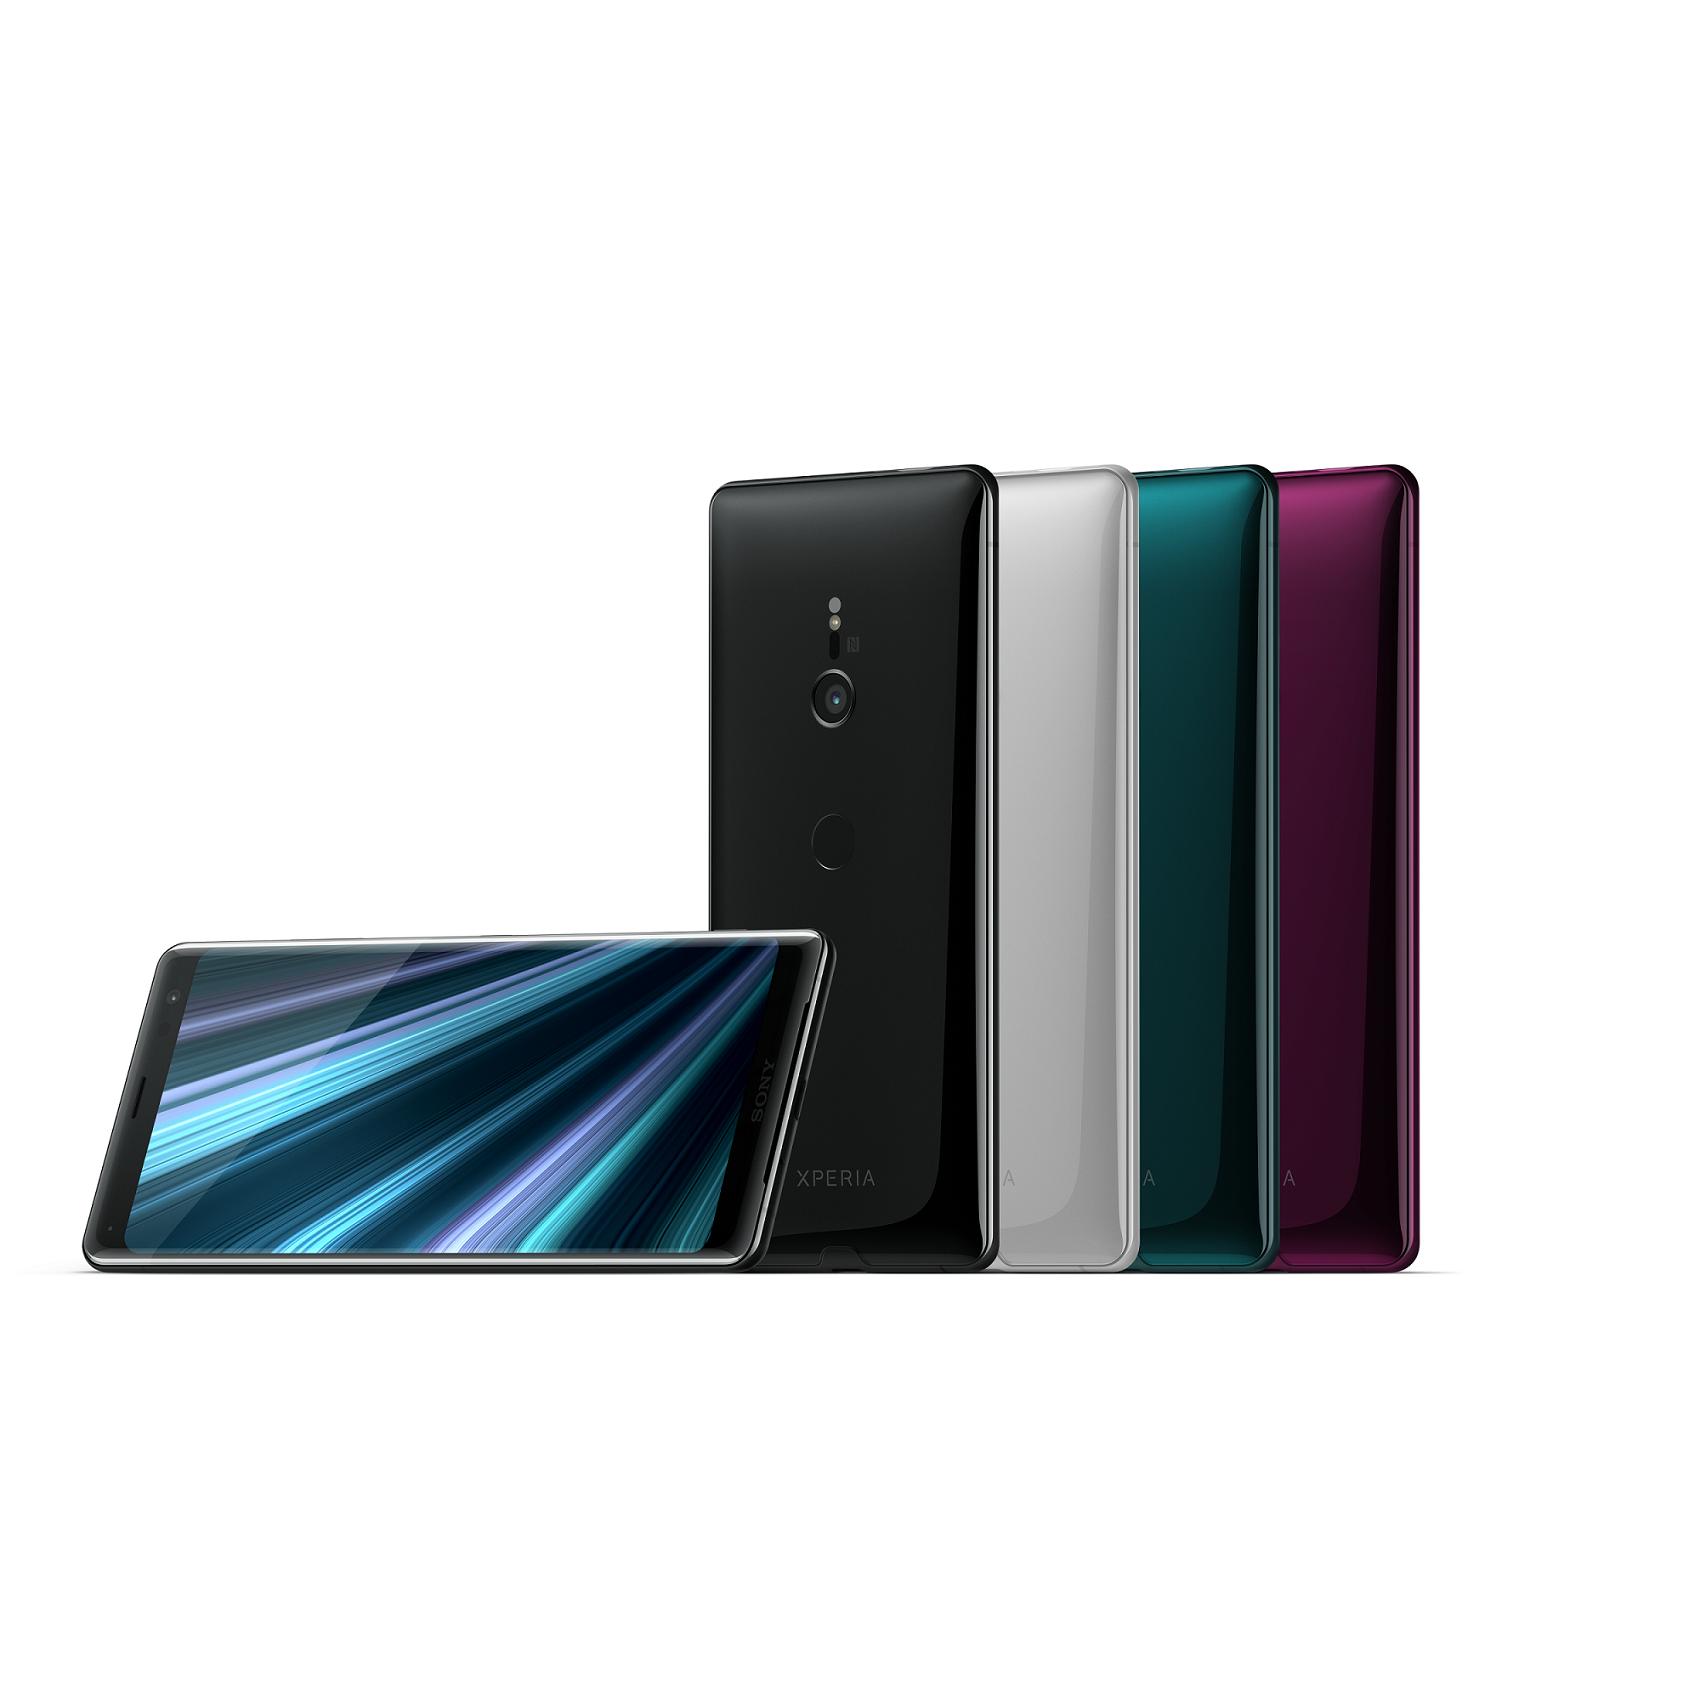 IFA 2018 - Sony annonce le Xperia XZ3, son premier smartphone Oled